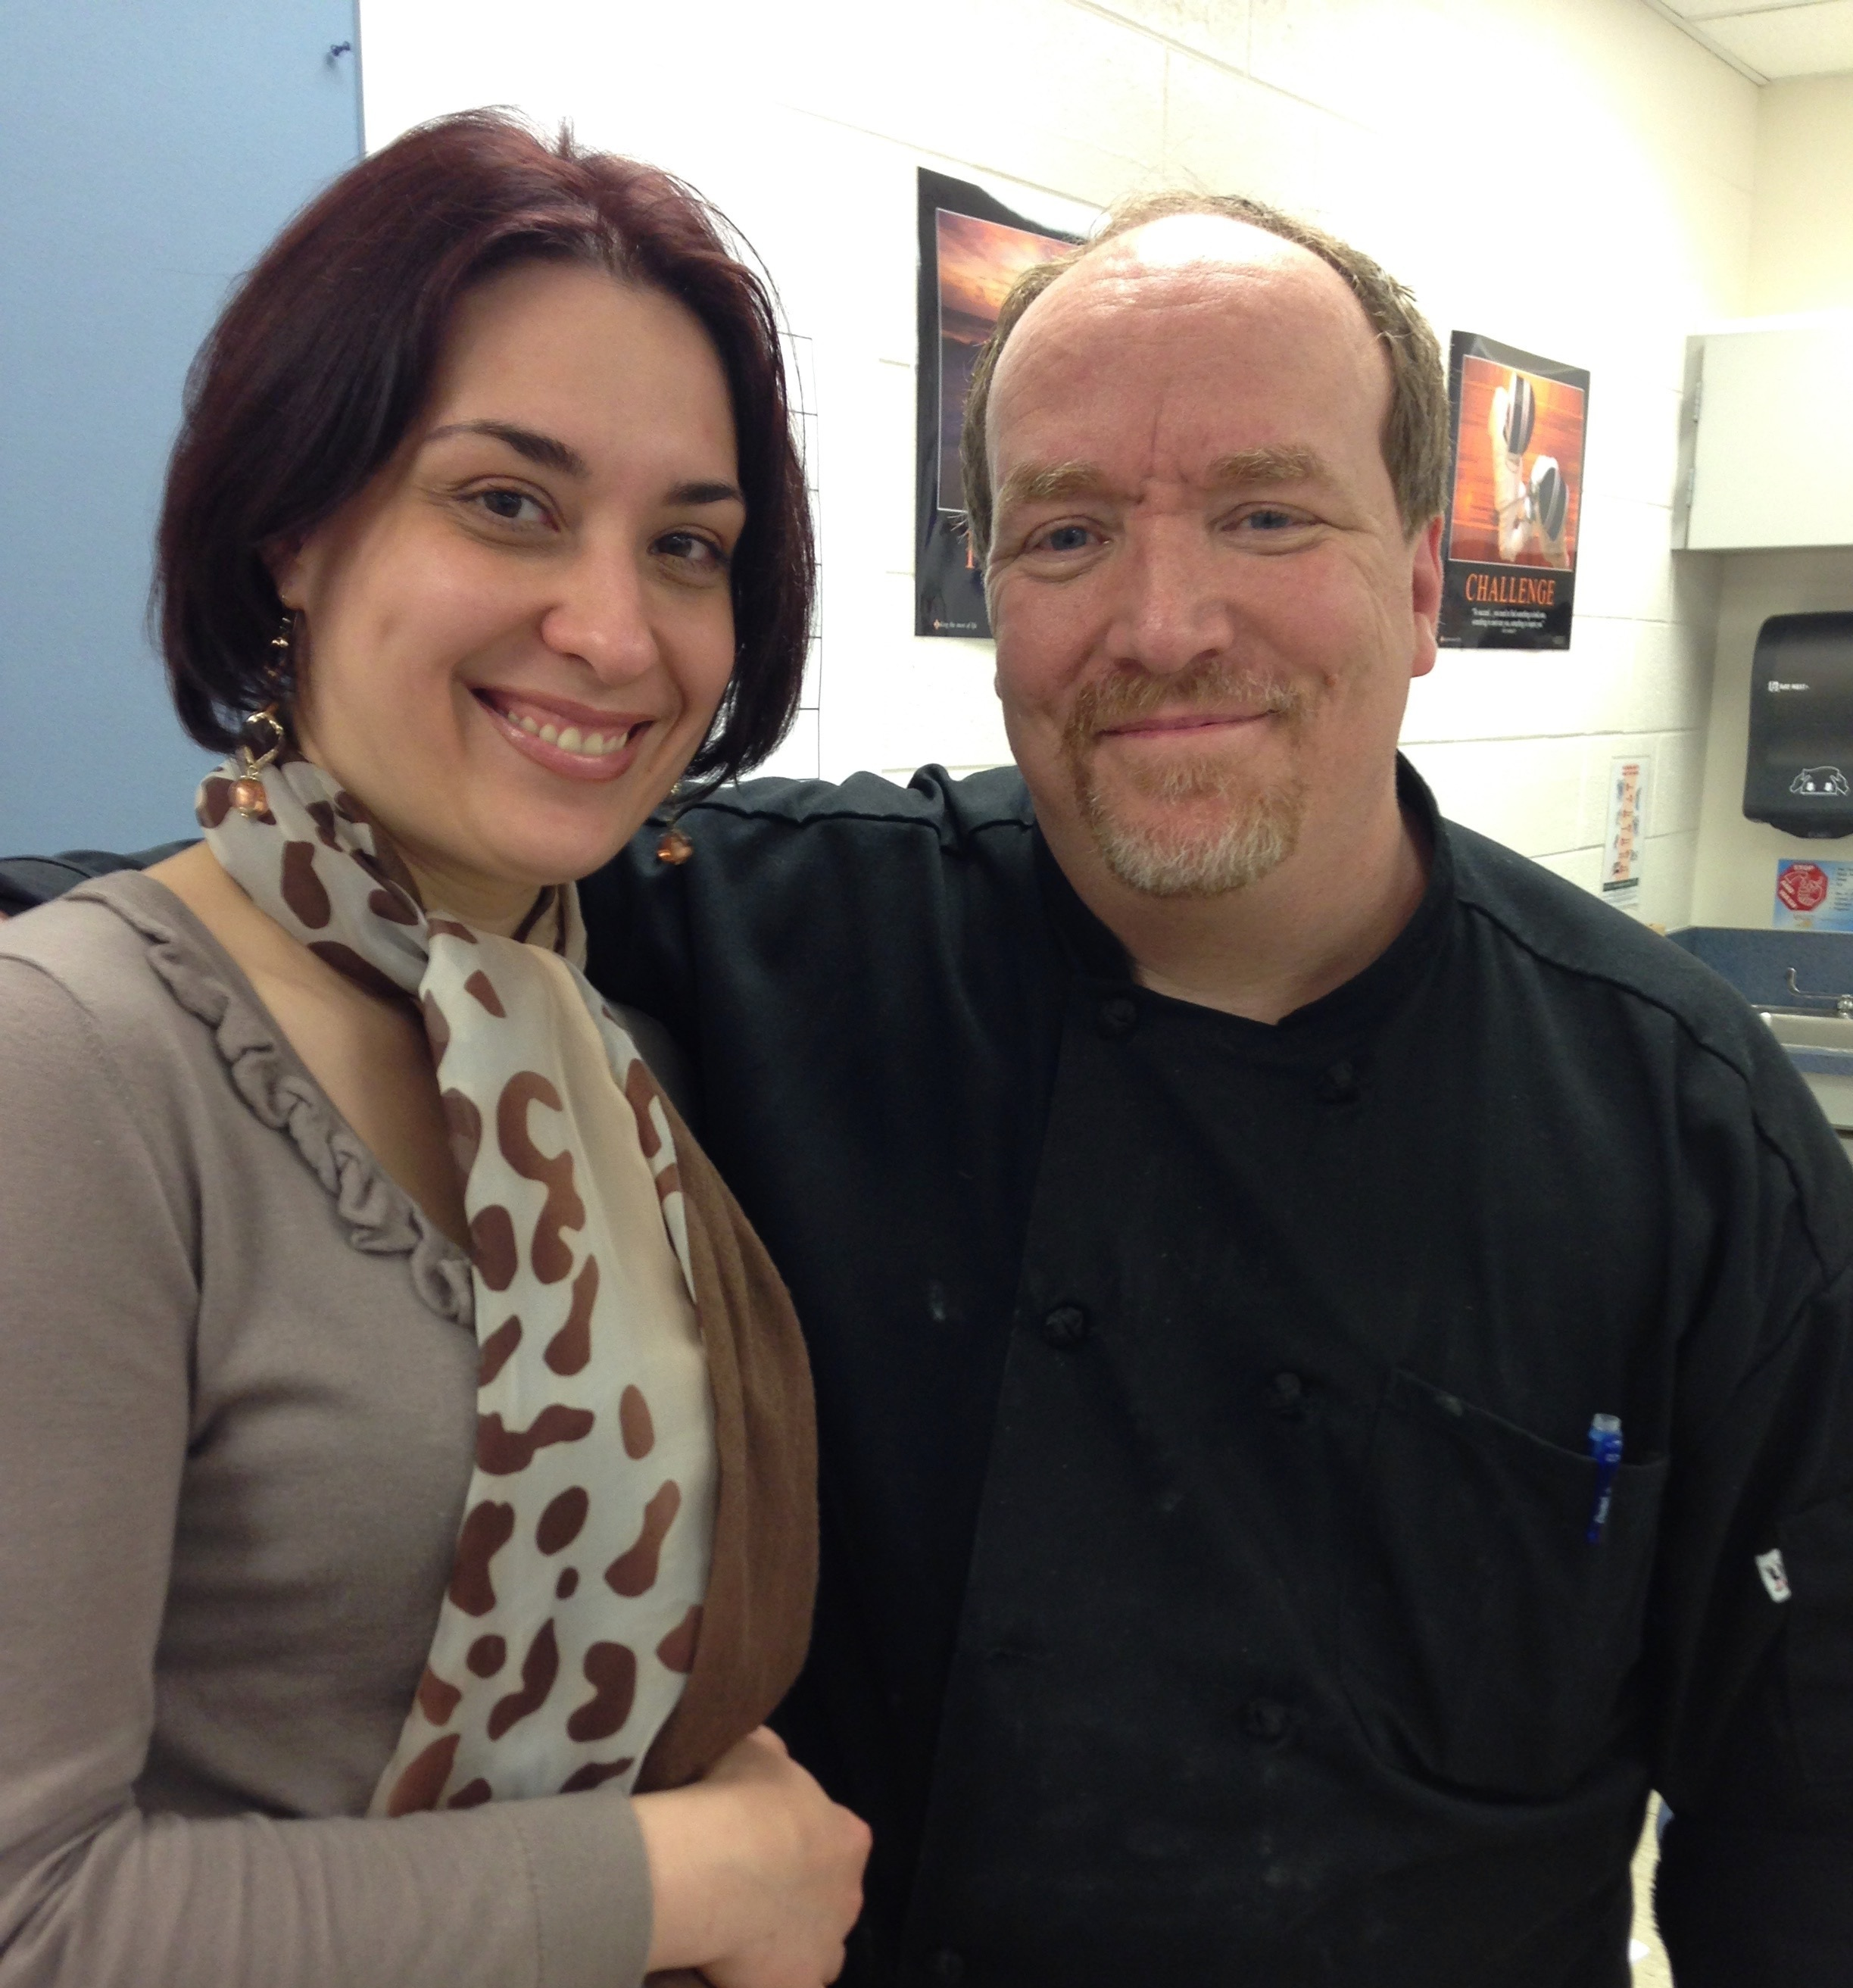 Mike McCarey and Tatiana Kovalenko